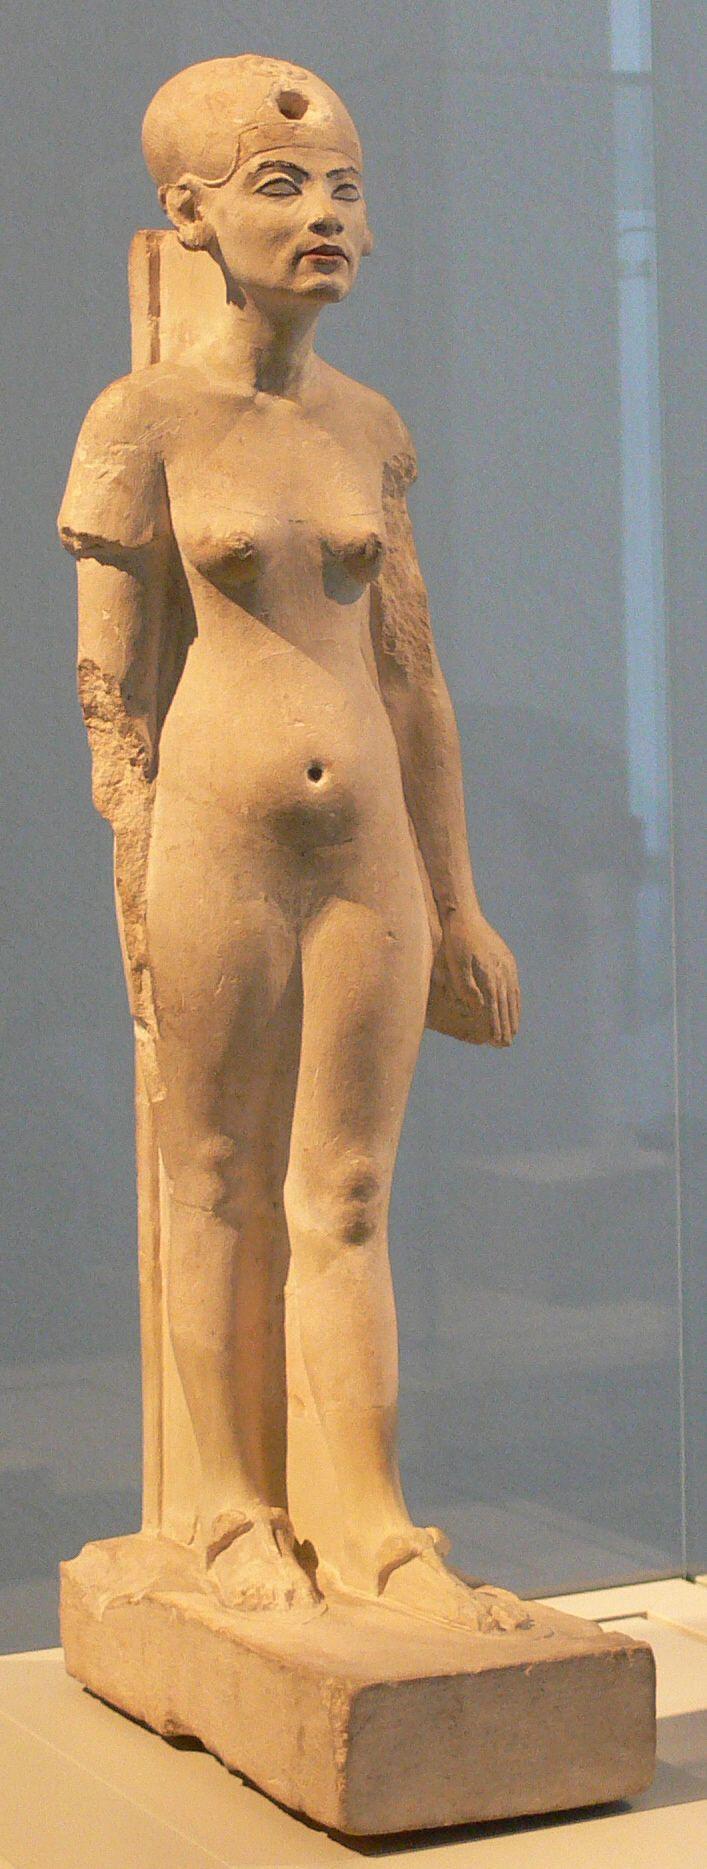 Standing-striding figure of Nefertiti - XVIII dynasty (Ägyptisches Museum, Berlin)